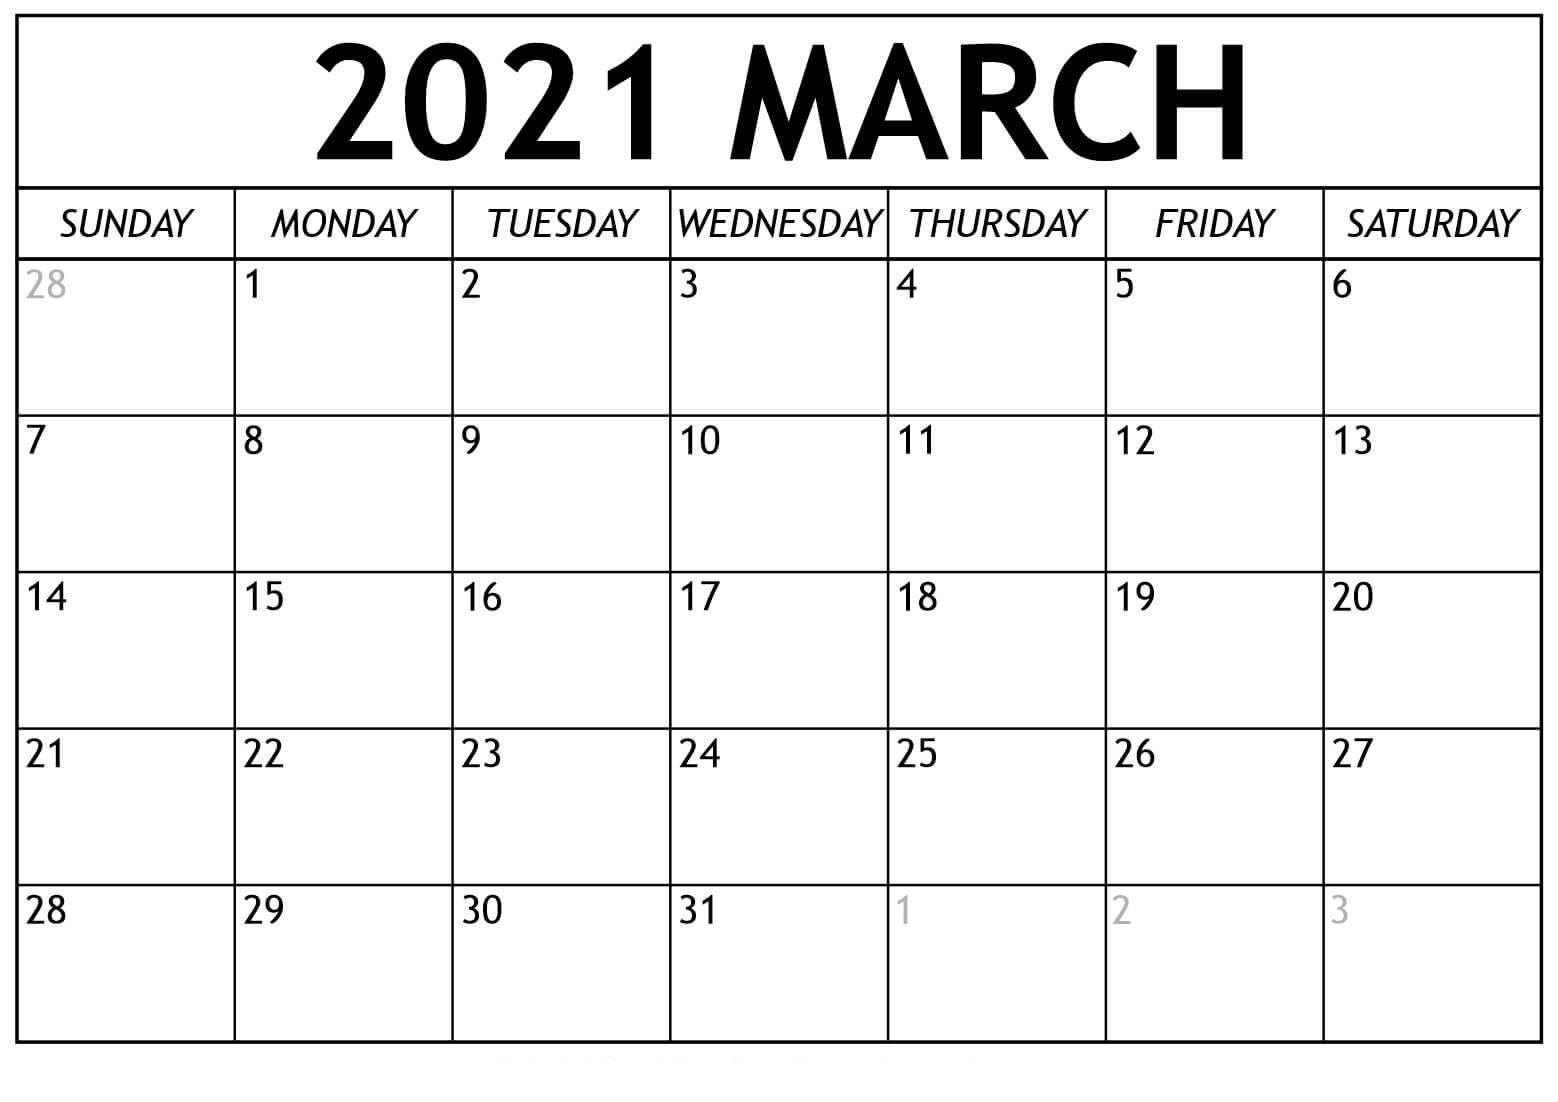 Blank March 2021 Calendar Editable Templates - Mycalendarlabs throughout 2021 Free Printable Weekly Calendar Blank Image